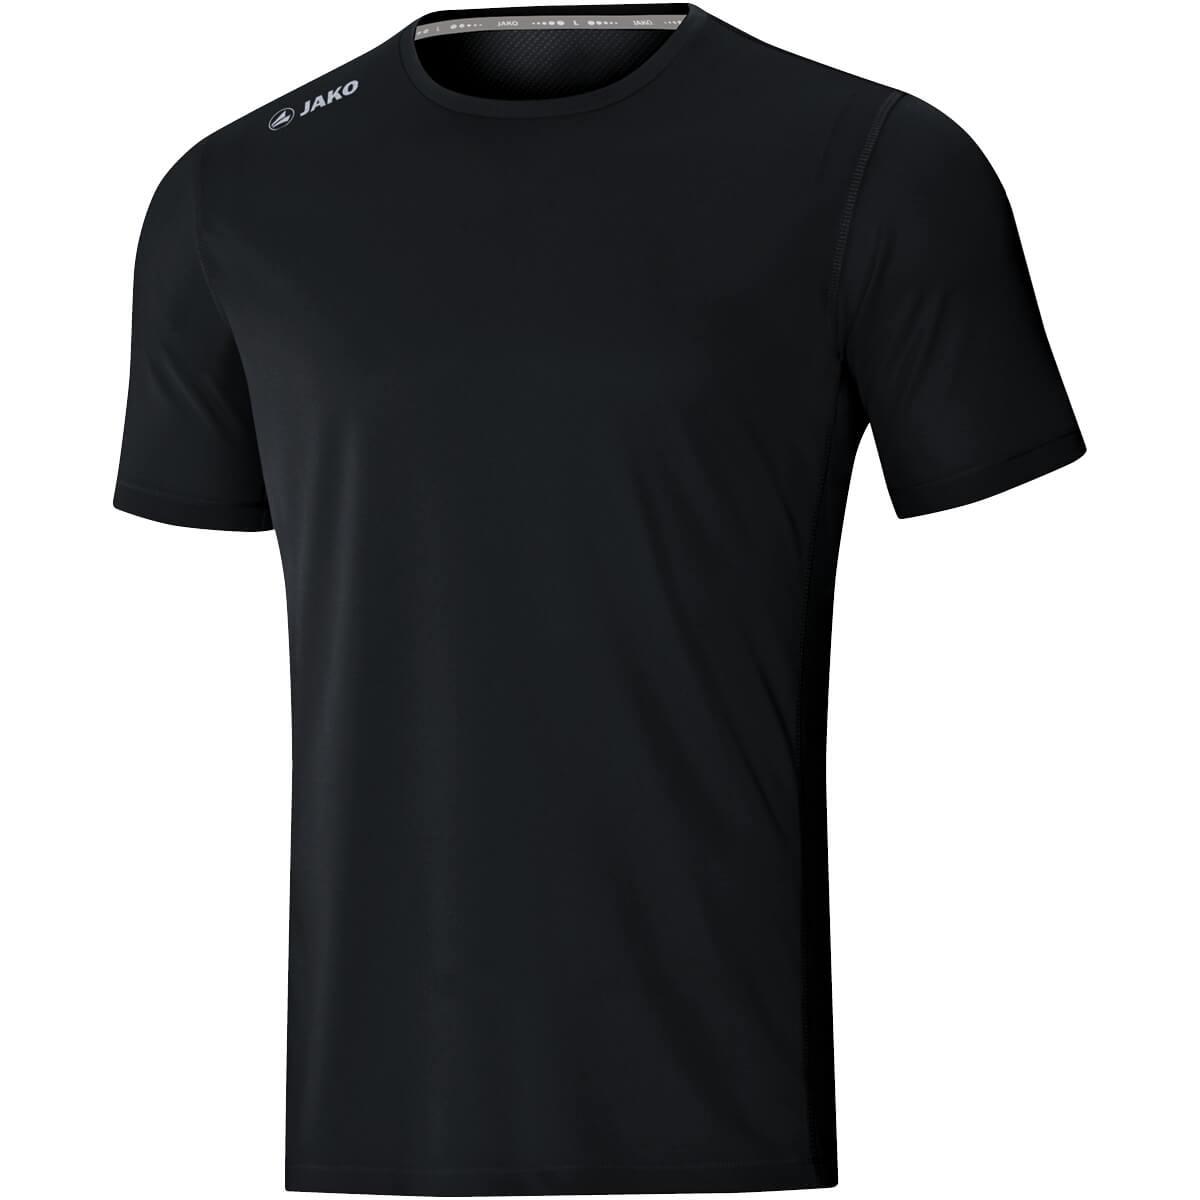 Jako T-Shirt Run 2.0 Kinder 6175  | div. Größen / Farben